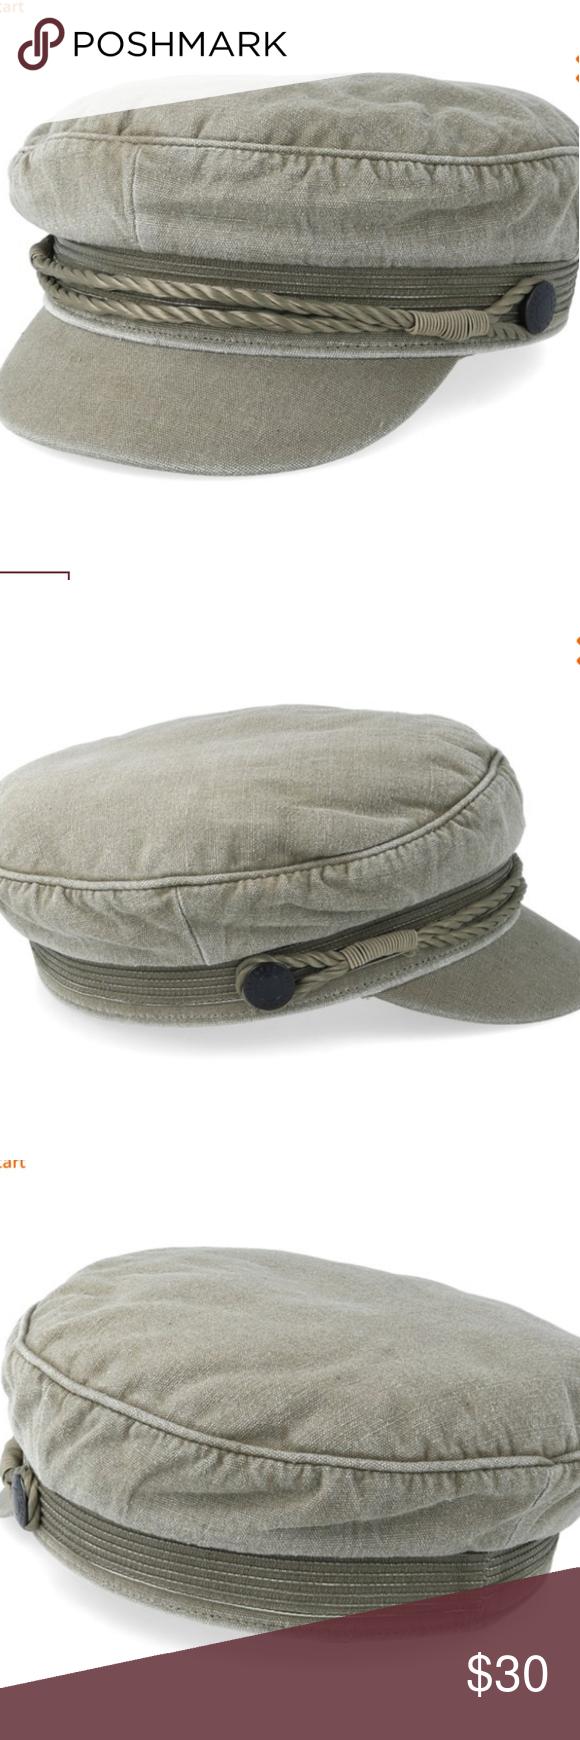 Vntg Nwot Billabong Jack Fiddler Hat Fiddler Hat Sweatband Logo Buttons